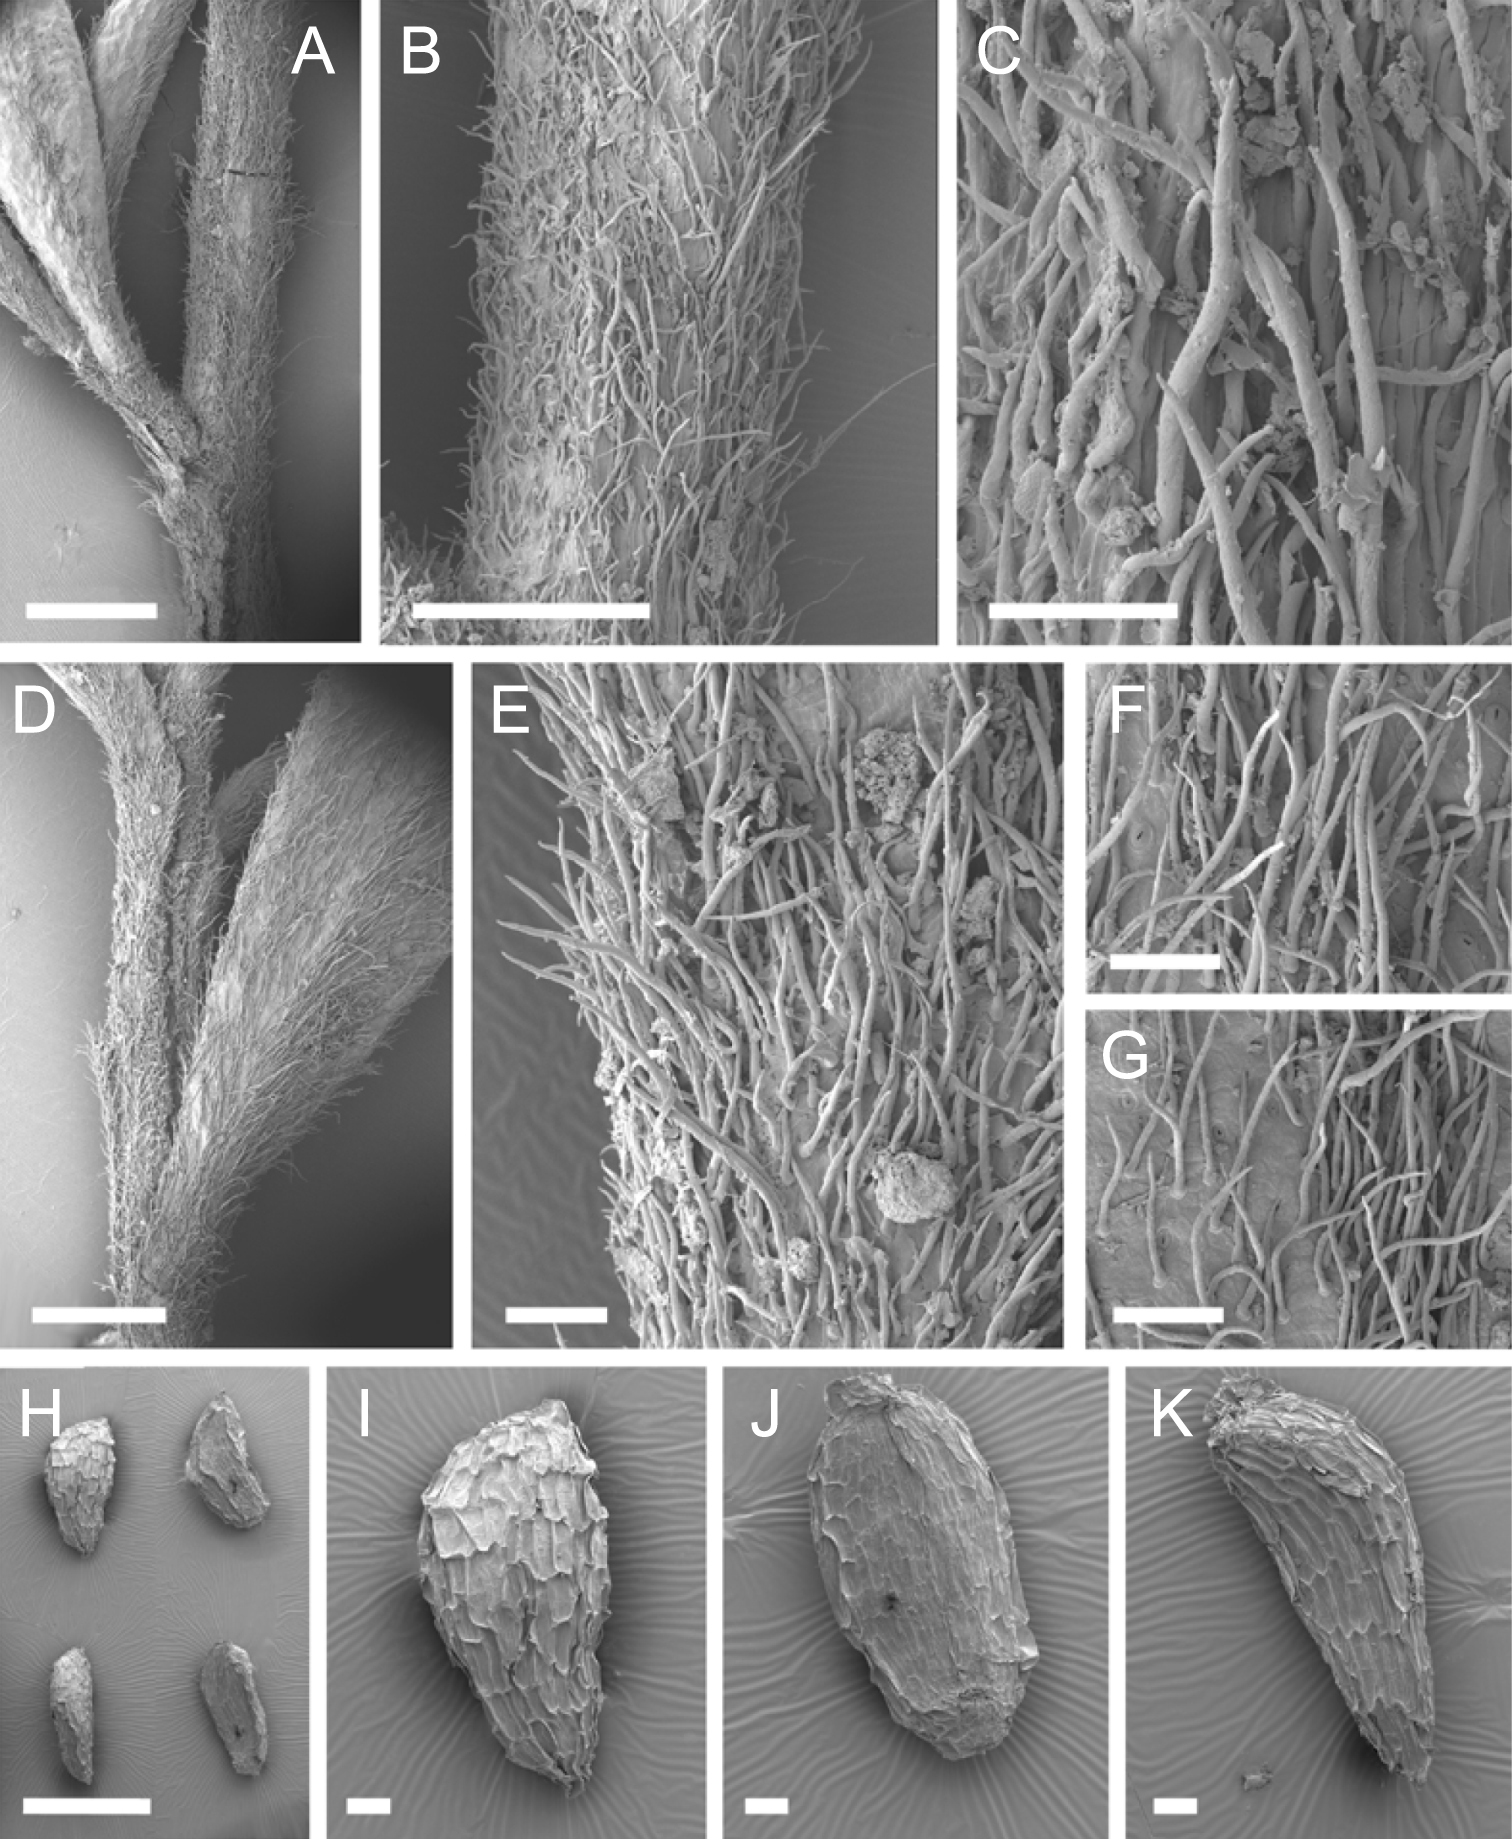 581.phytokeys 40 7973 sp 10 p 7